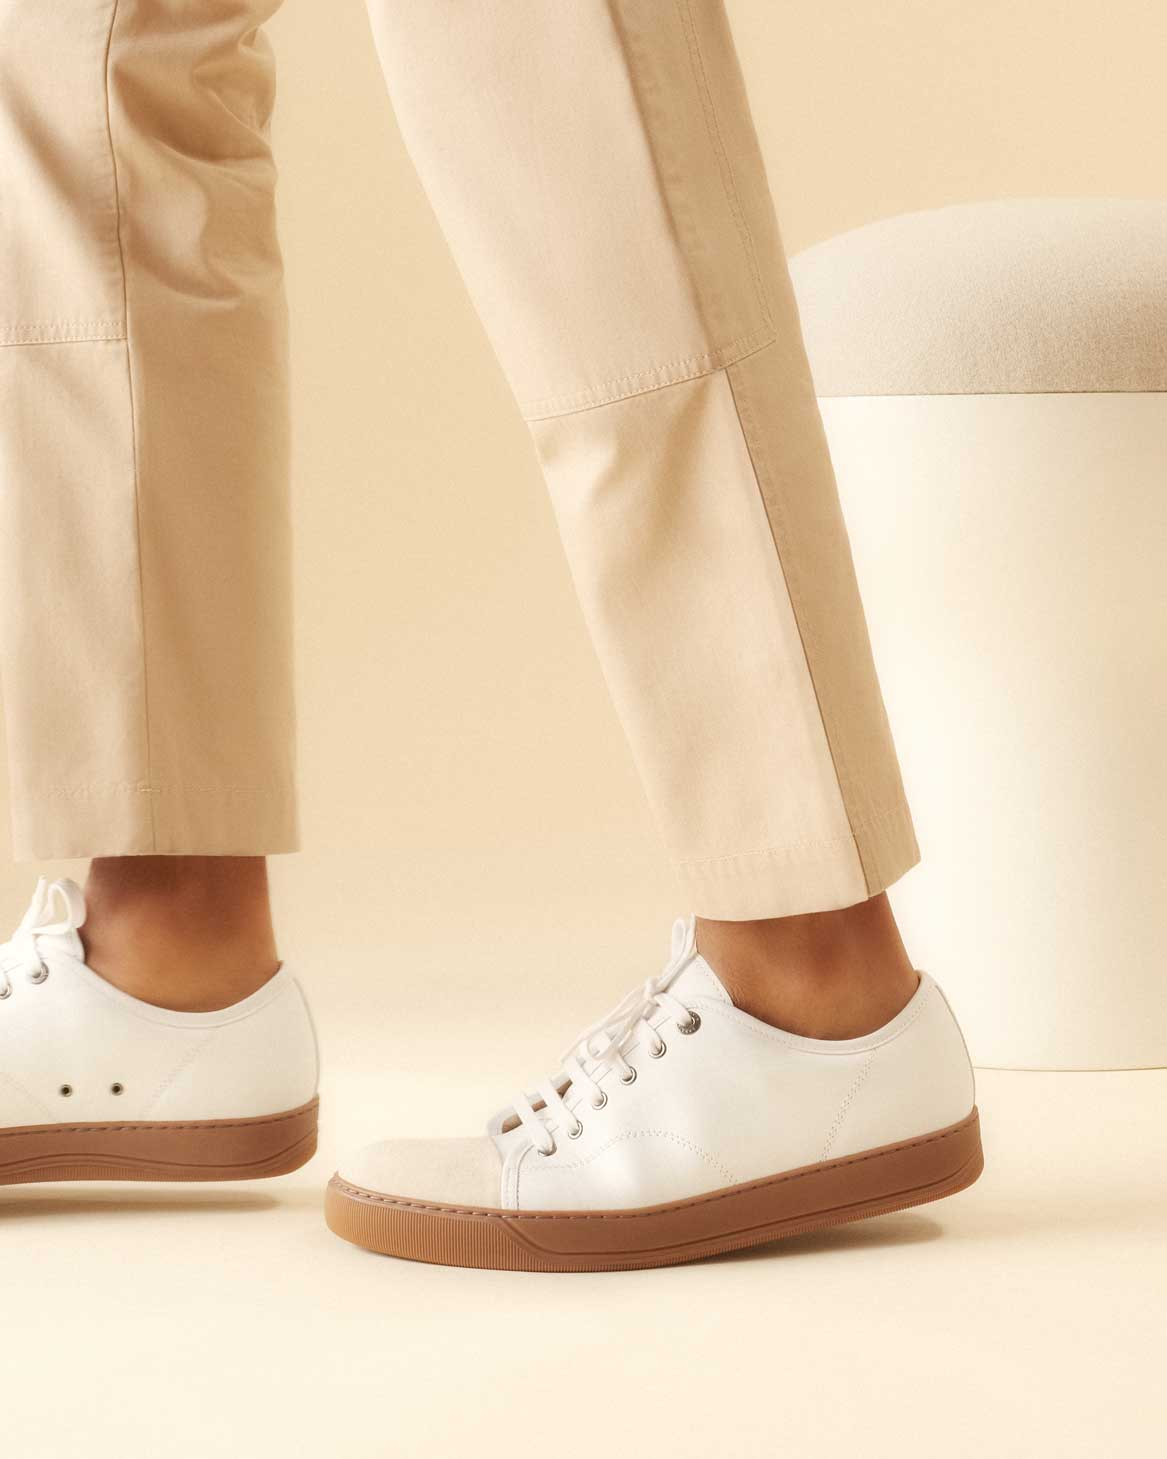 DBB1 Sneakers Weiss